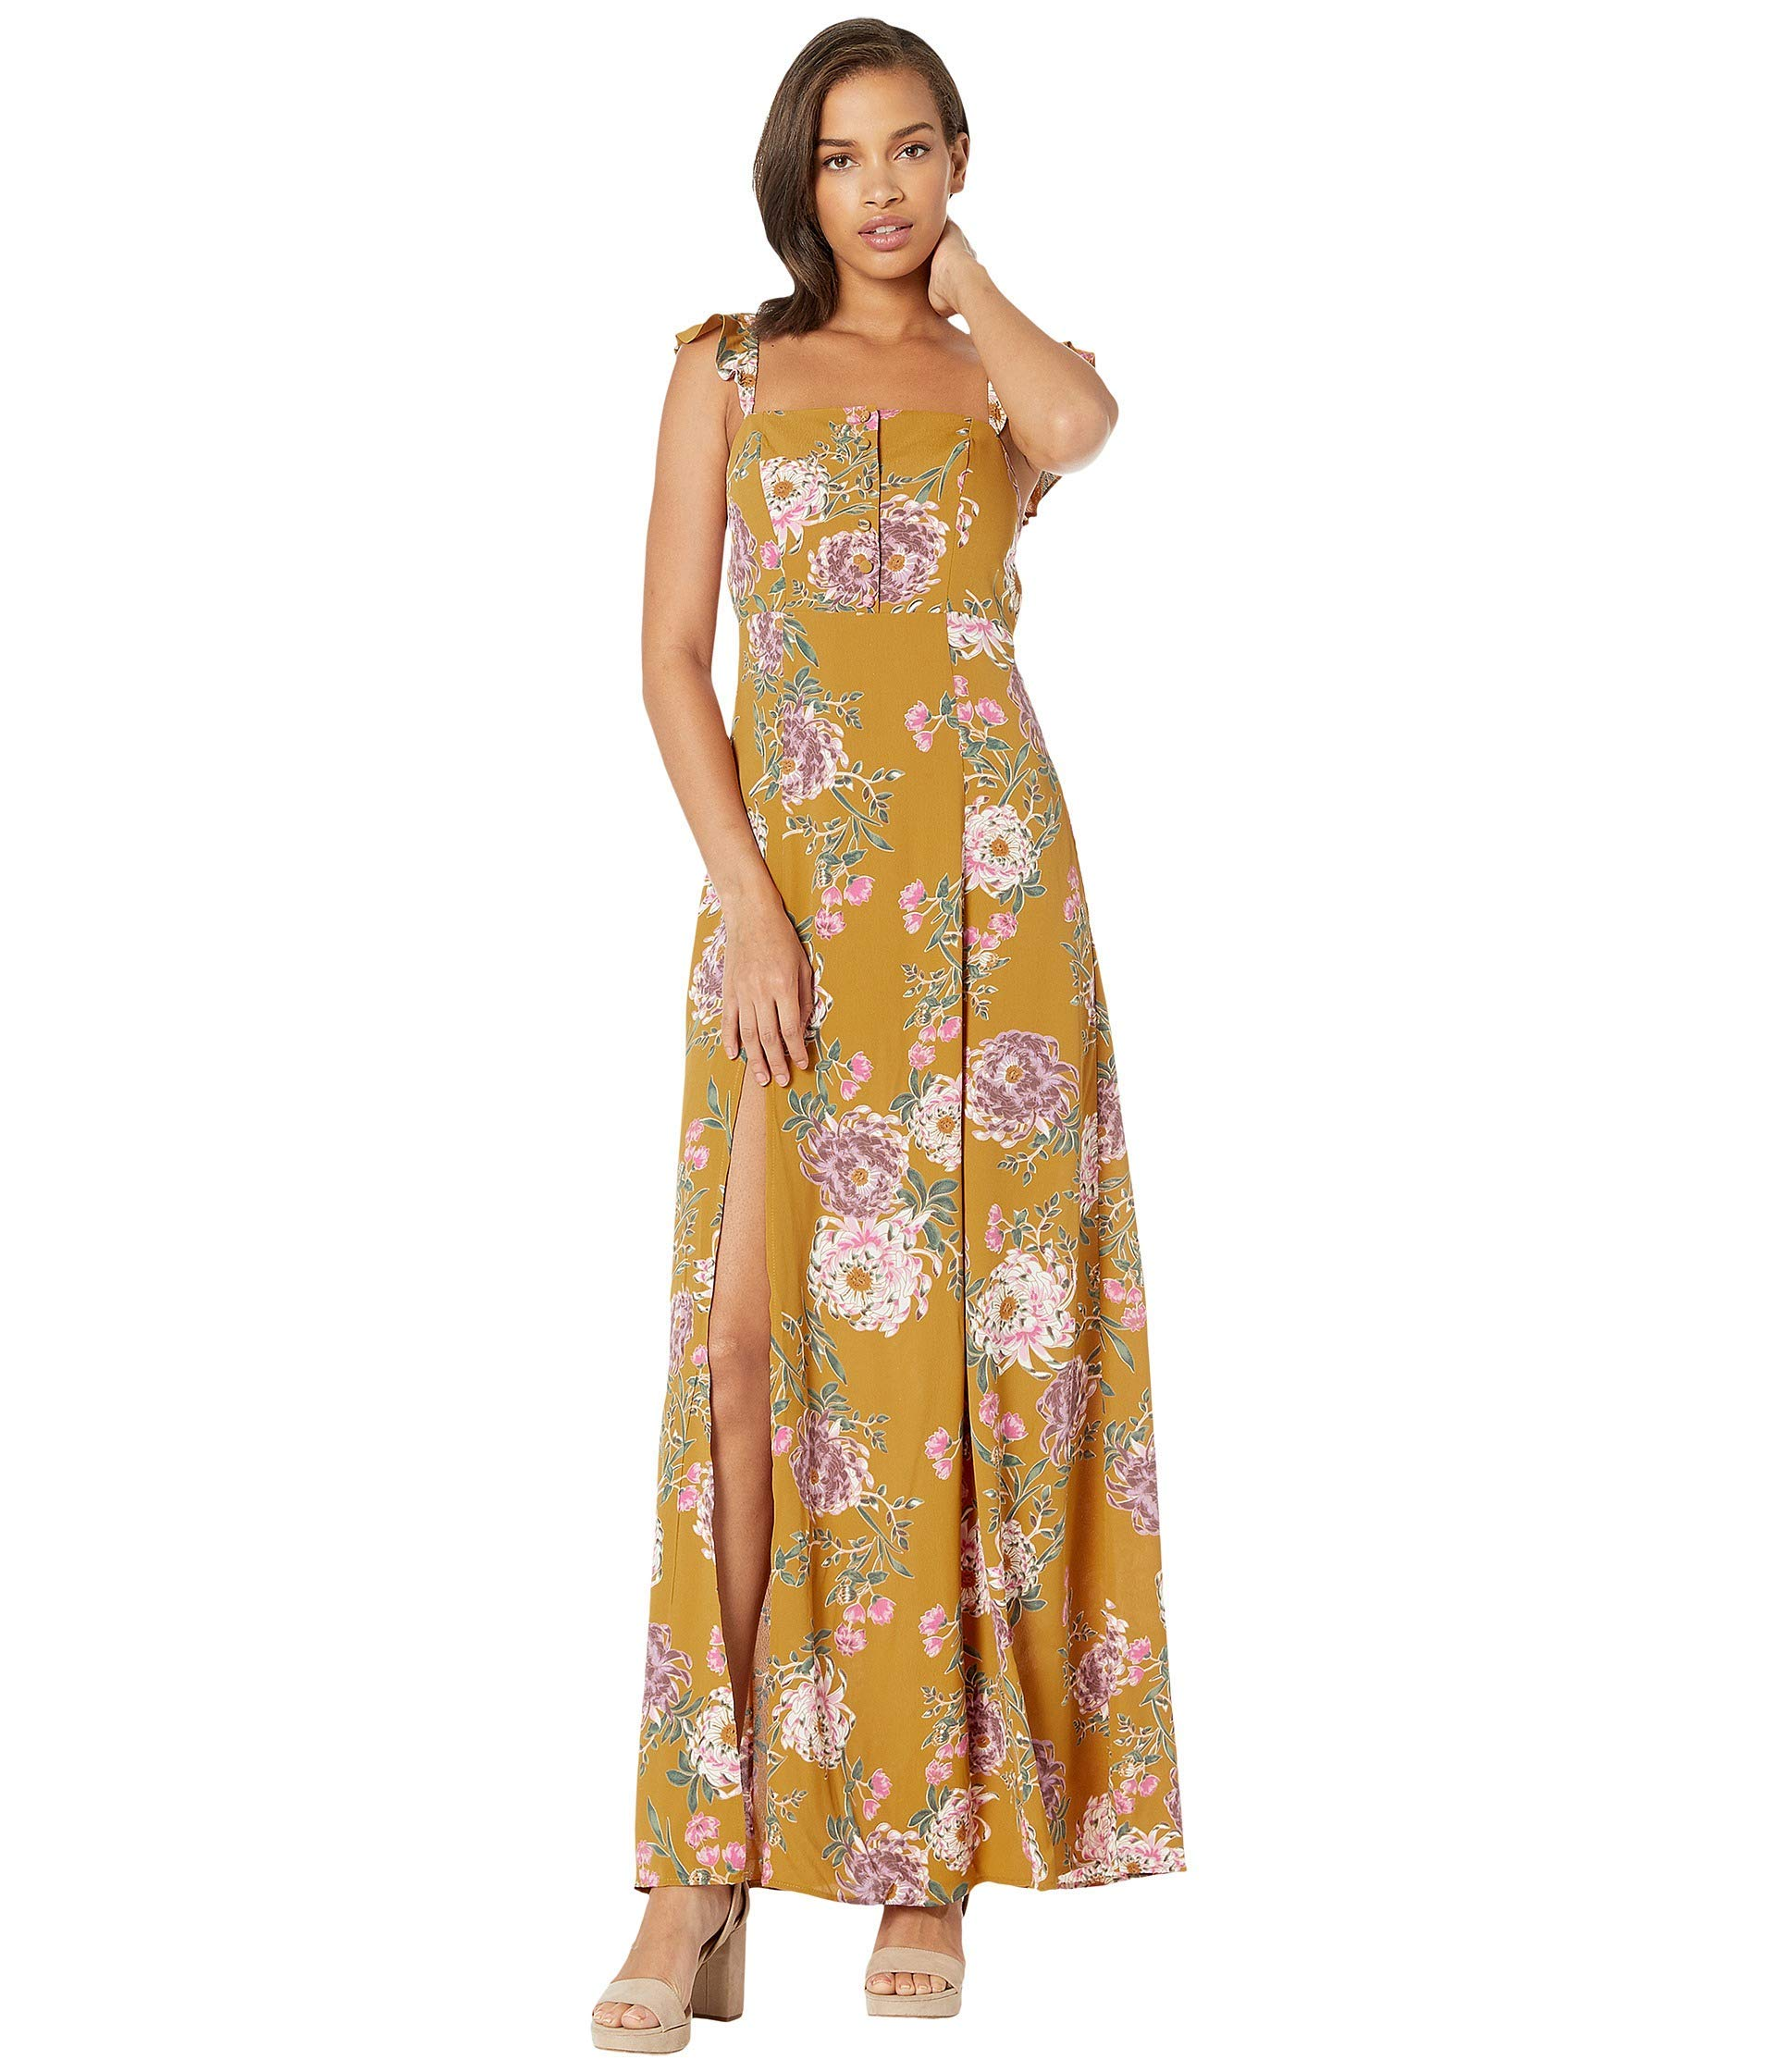 Available at Amazon: Flynn Skye Women's Bardot Maxi Dress